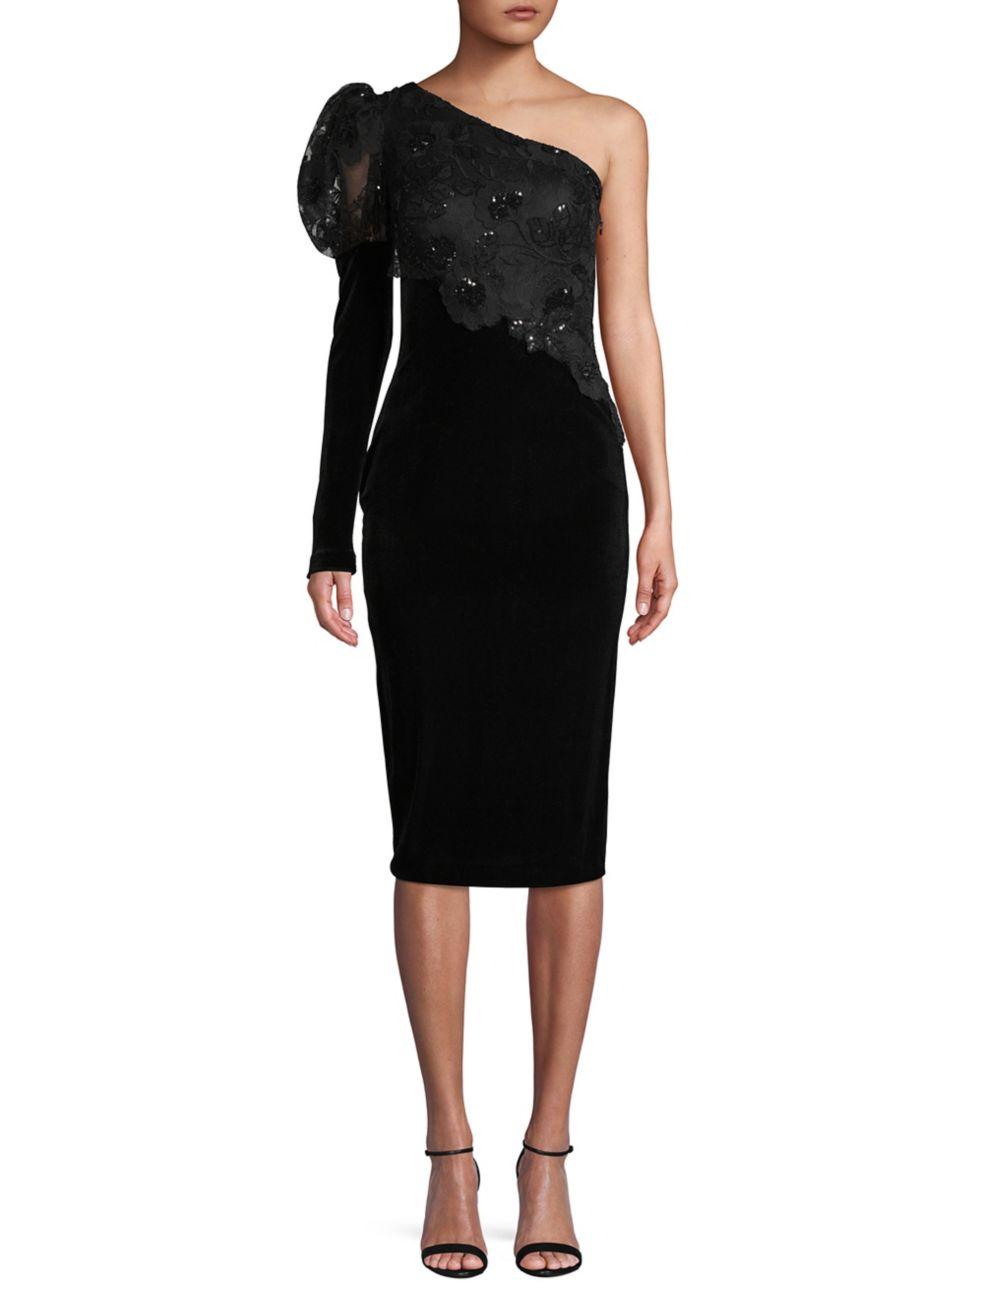 Embellished One-Shoulder Sheath Dress - $470 | $329 on SALE with code: FRIENDS, Nicole Bakti.